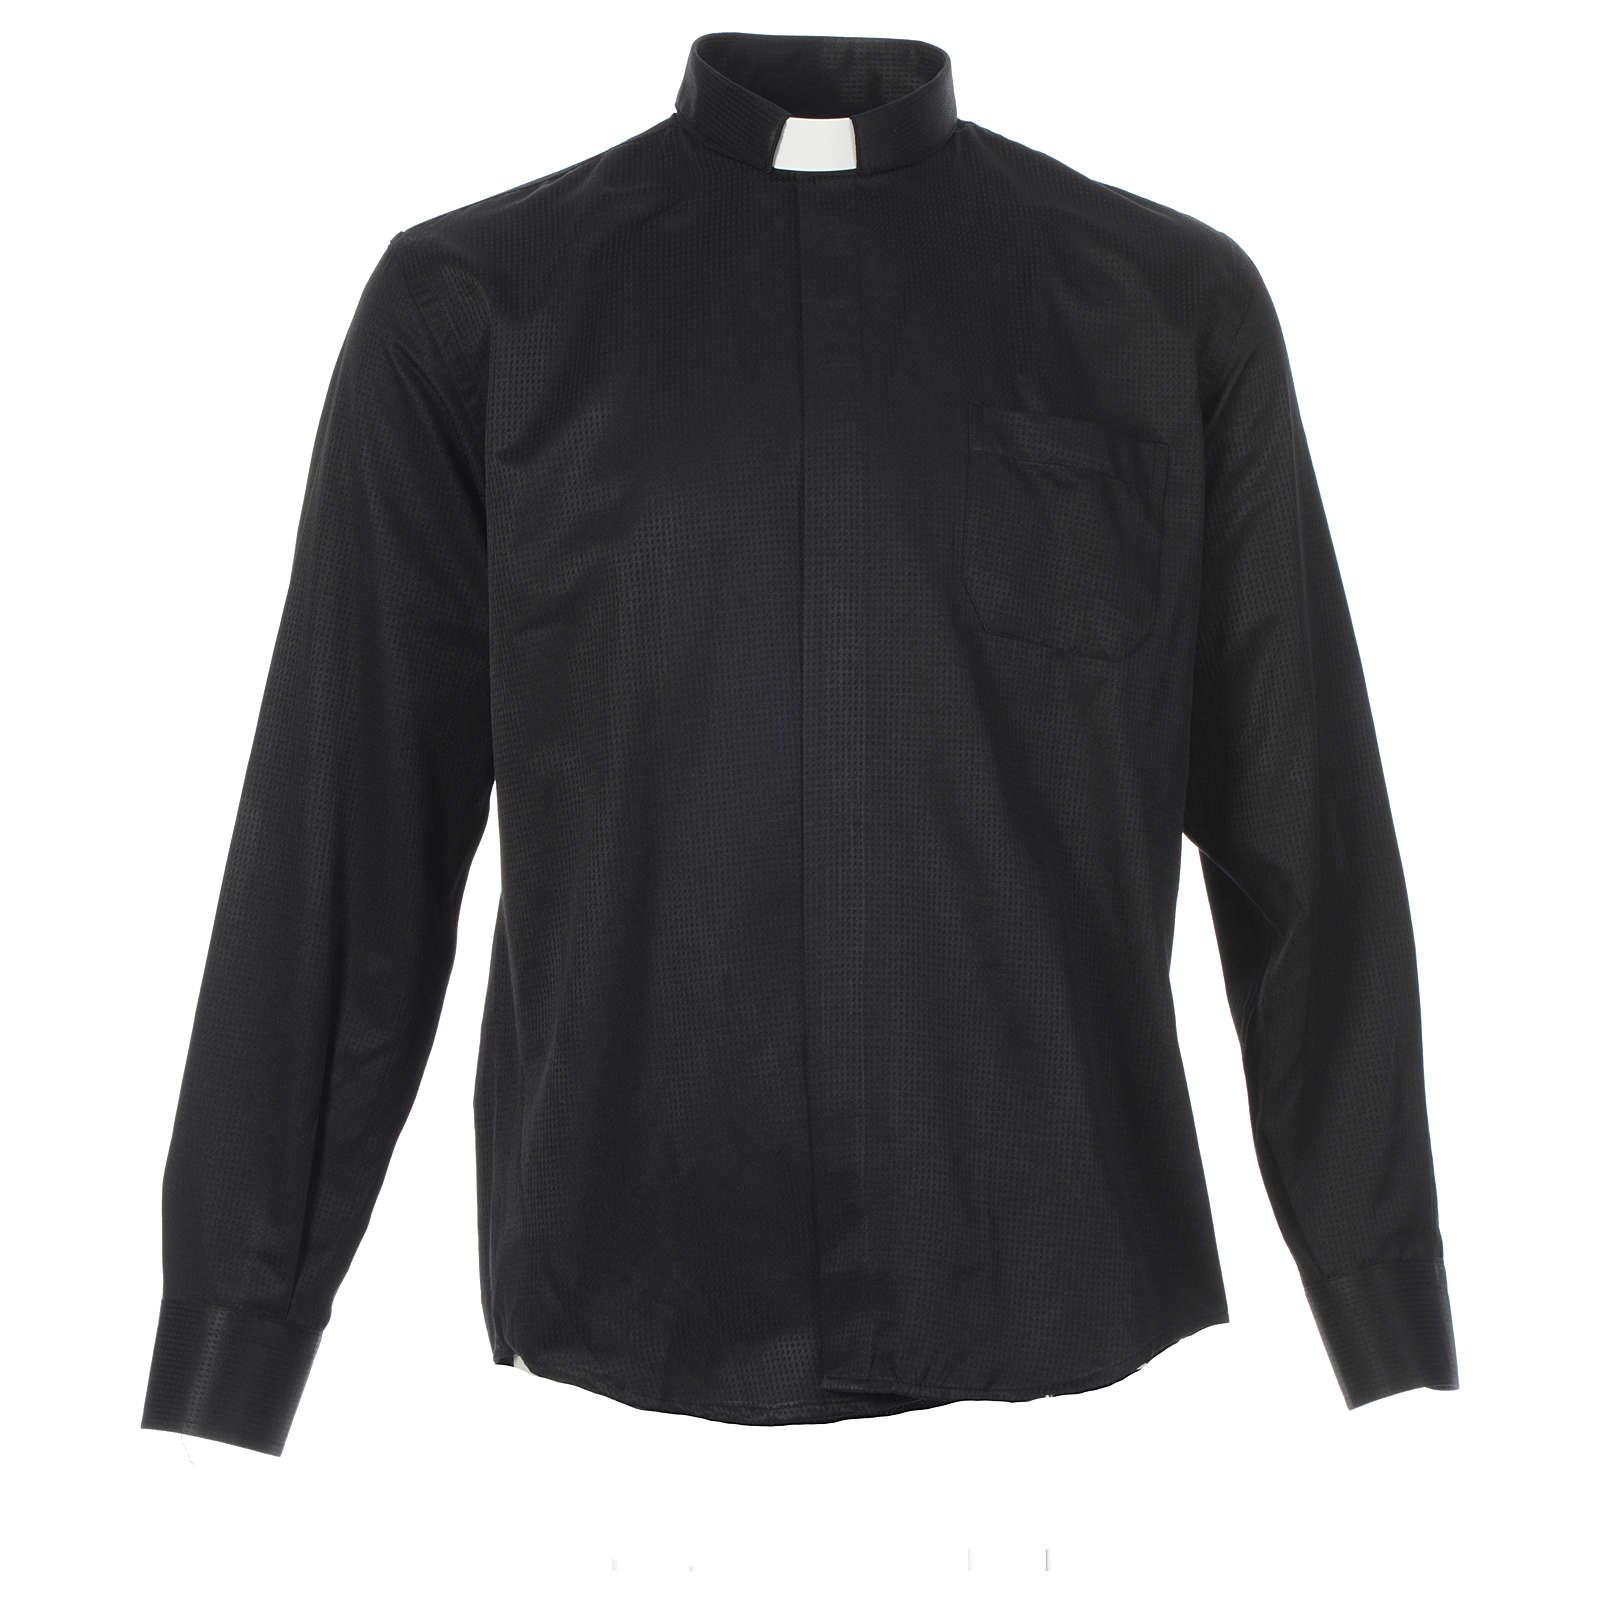 Camisa sacerdote jacquard preto manga longa 4